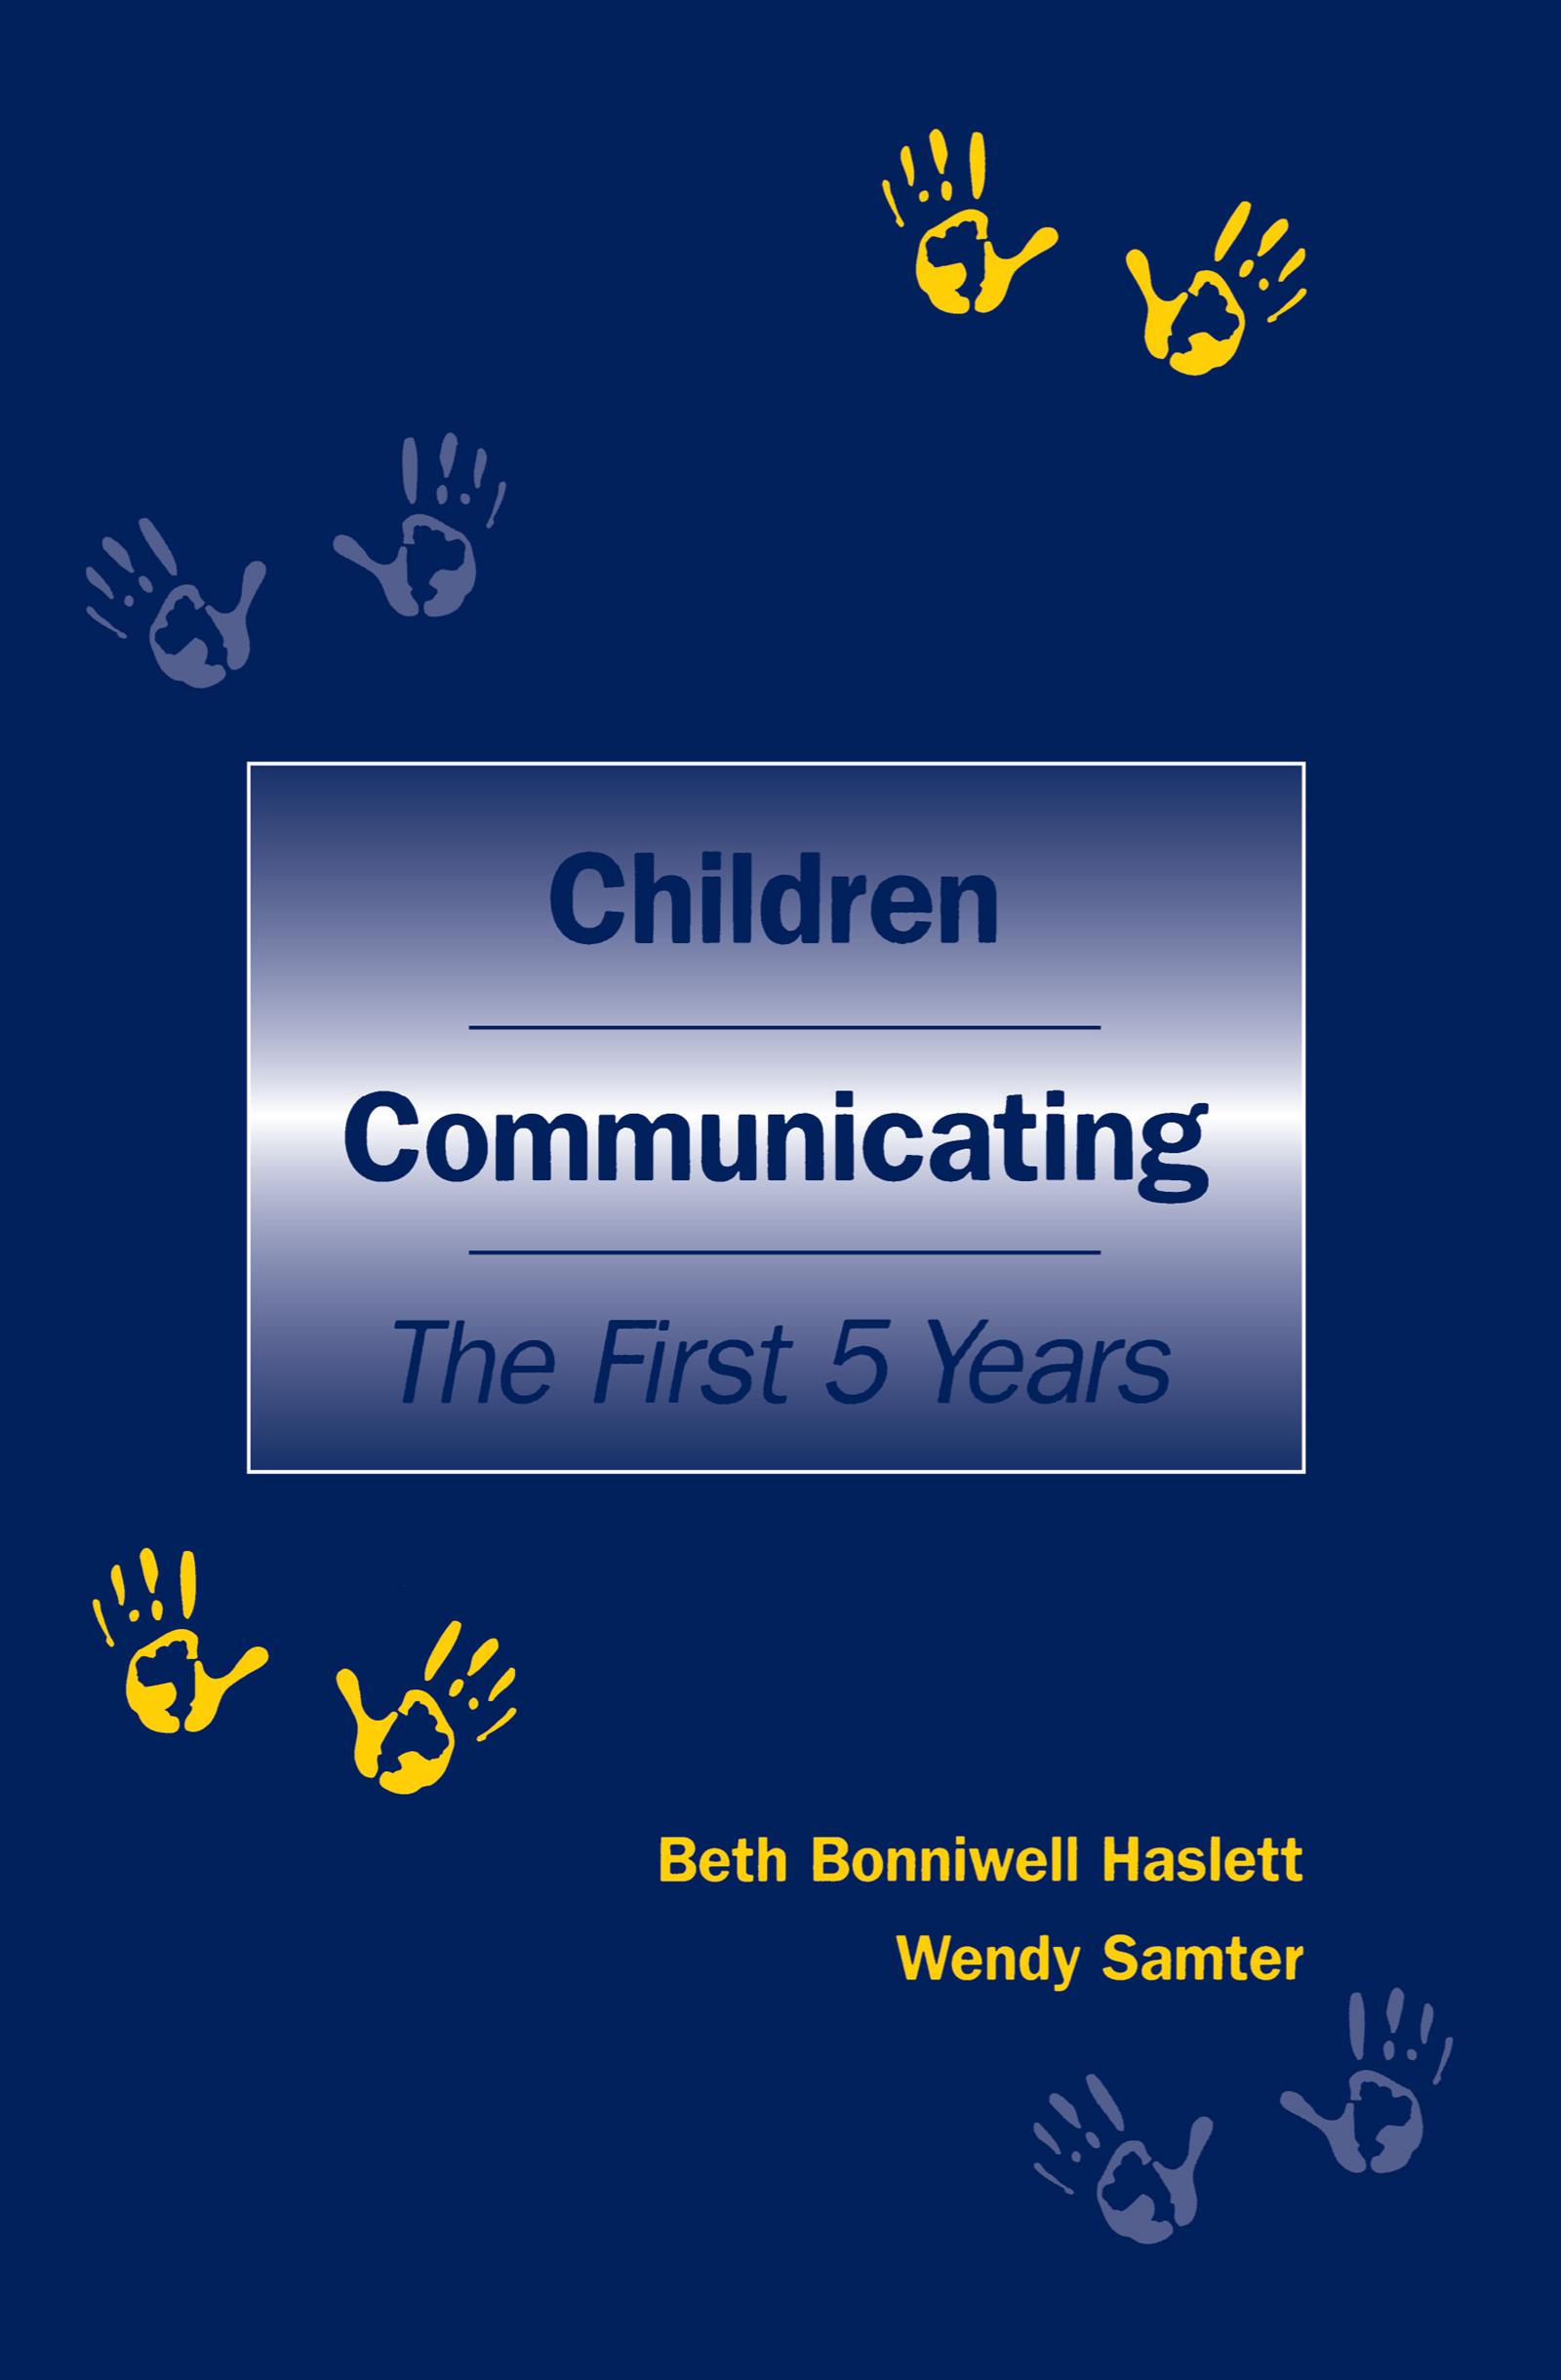 Children Communicating